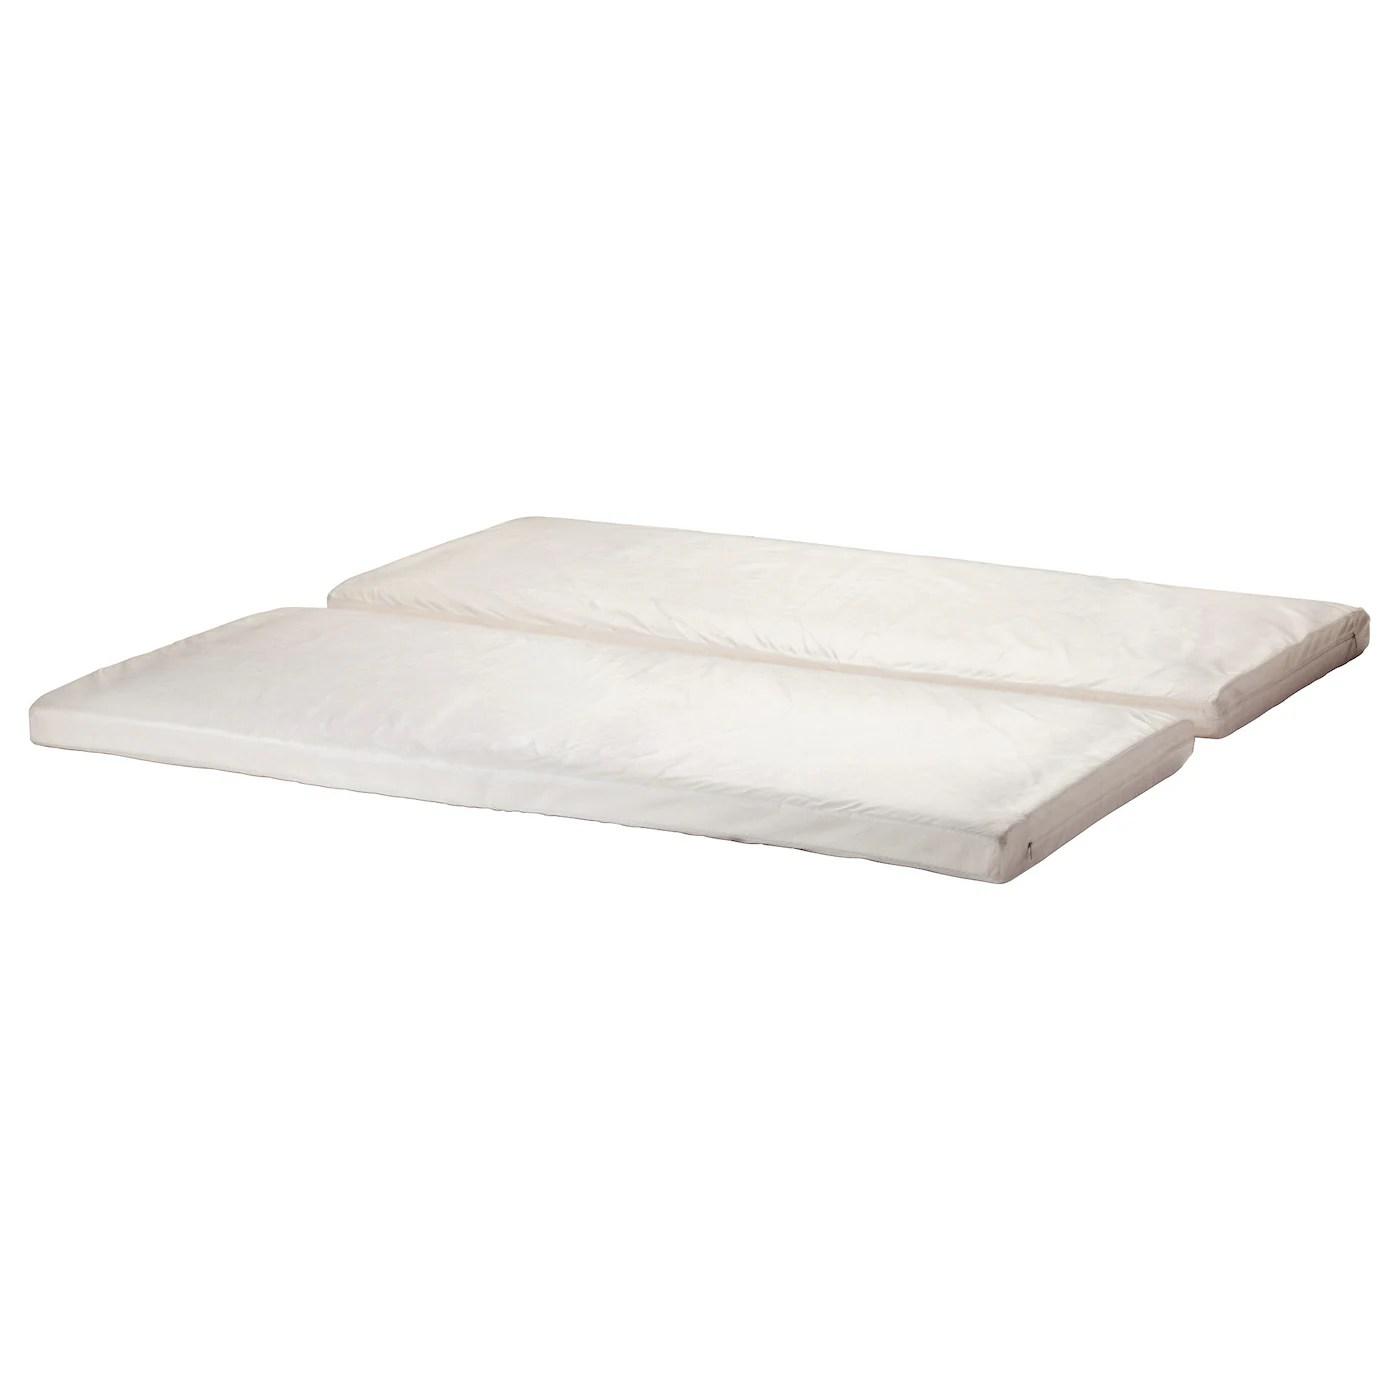 matelas pour bz ikea clic clac 160x200 ikea. Black Bedroom Furniture Sets. Home Design Ideas